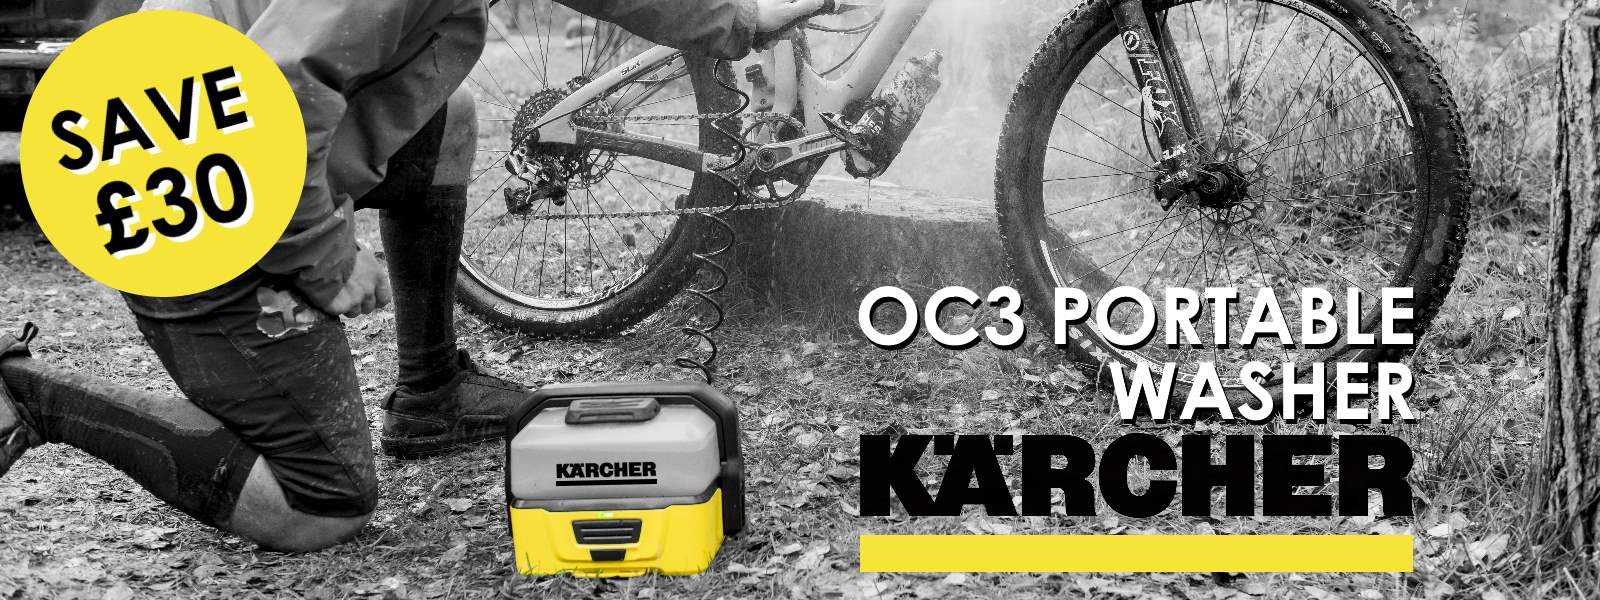 Karcher OC3